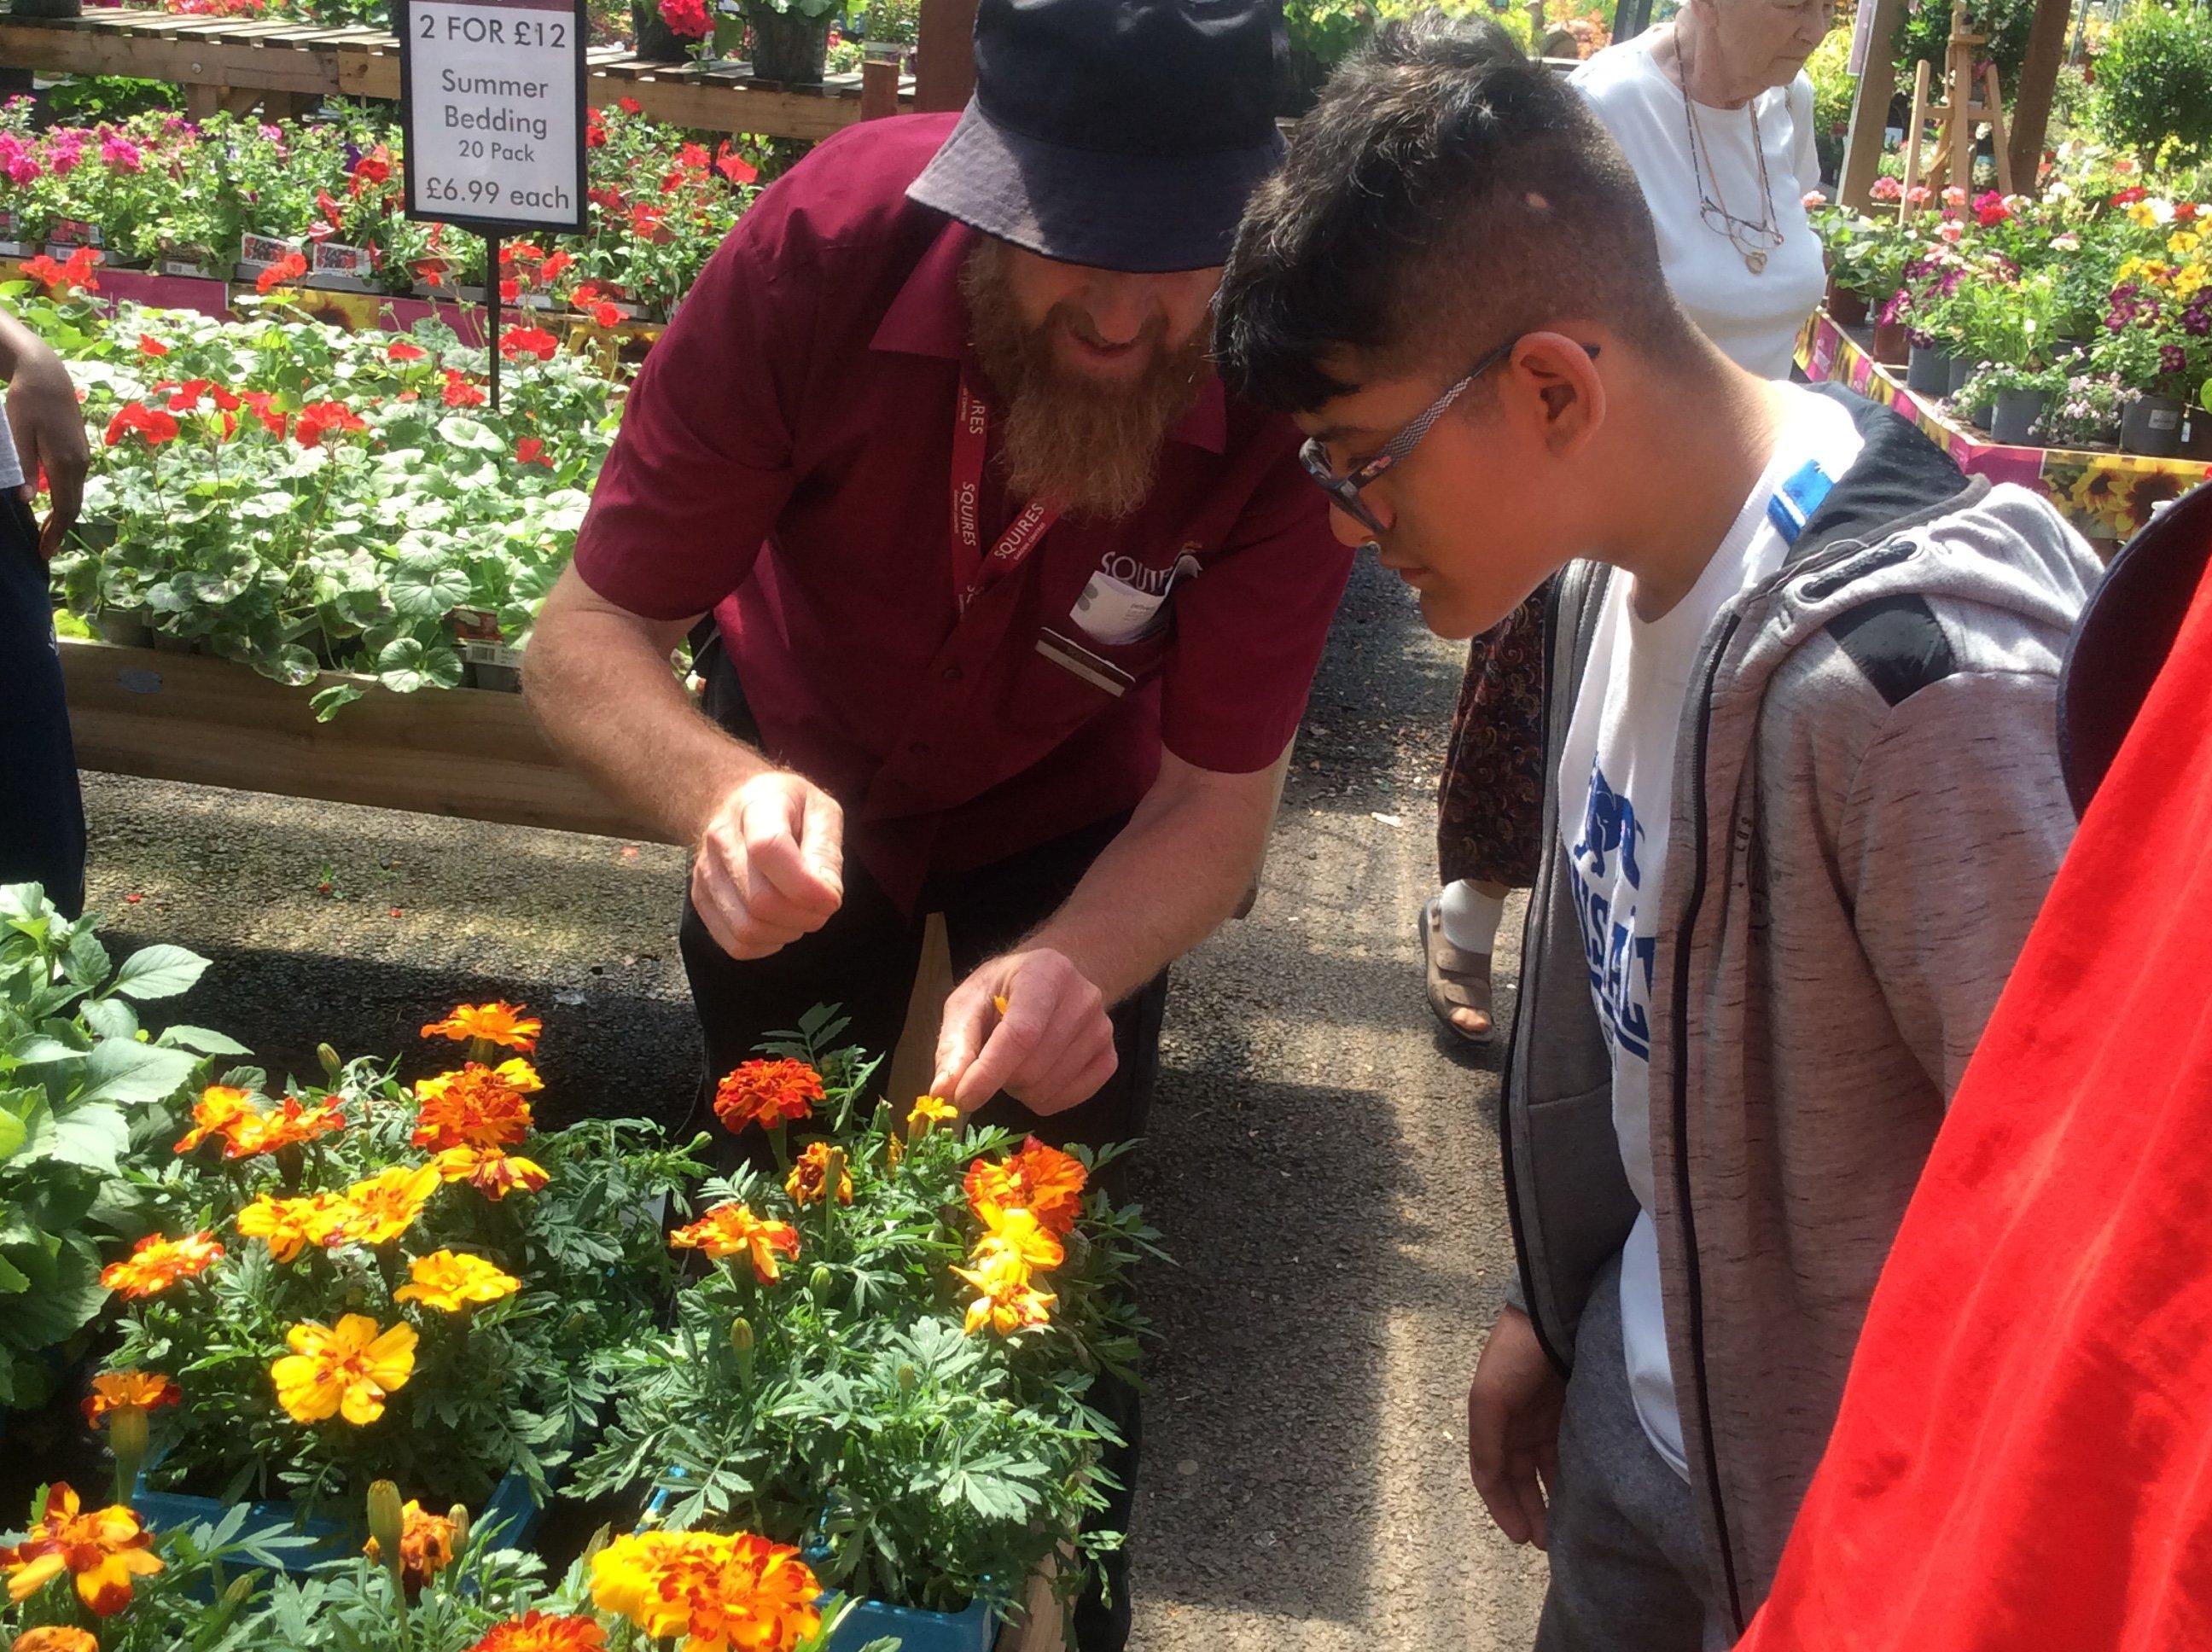 Young person at garden centre